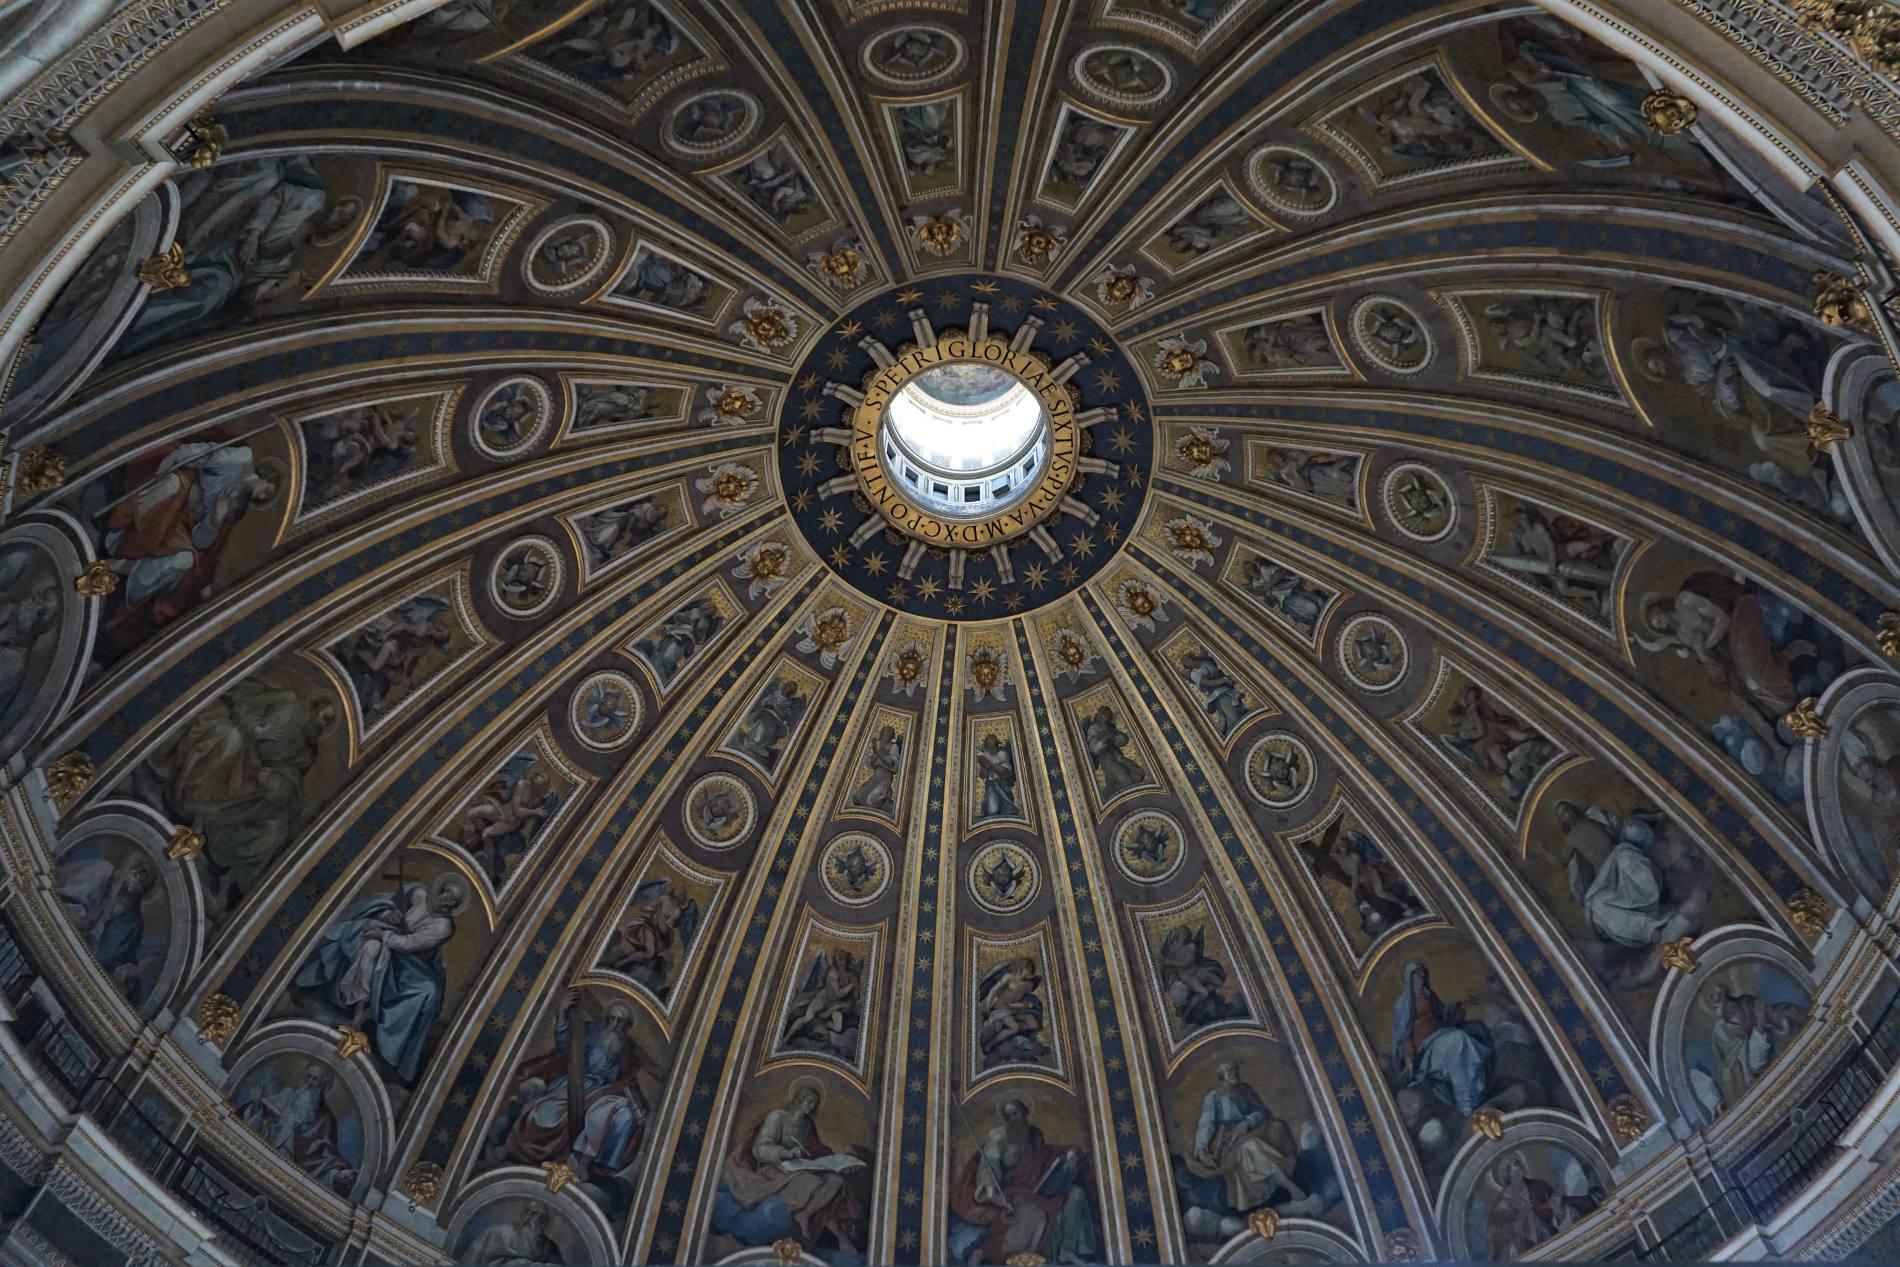 Lavish decoration of the interior of Saint Peter's Basilica. Source: Truevoyagers